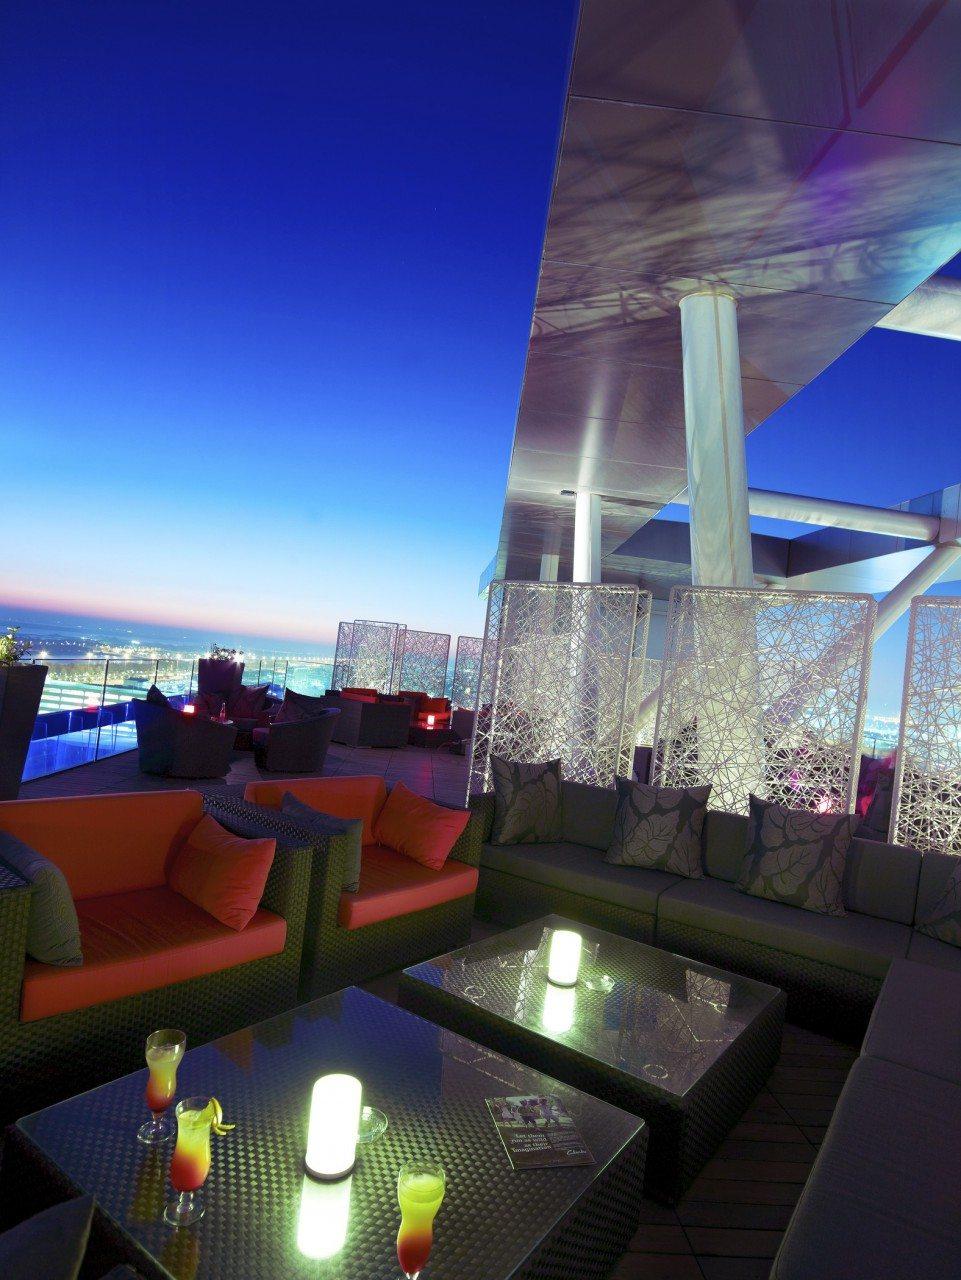 Zu Füßen. relax@12 im Aloft Abu Dhabi